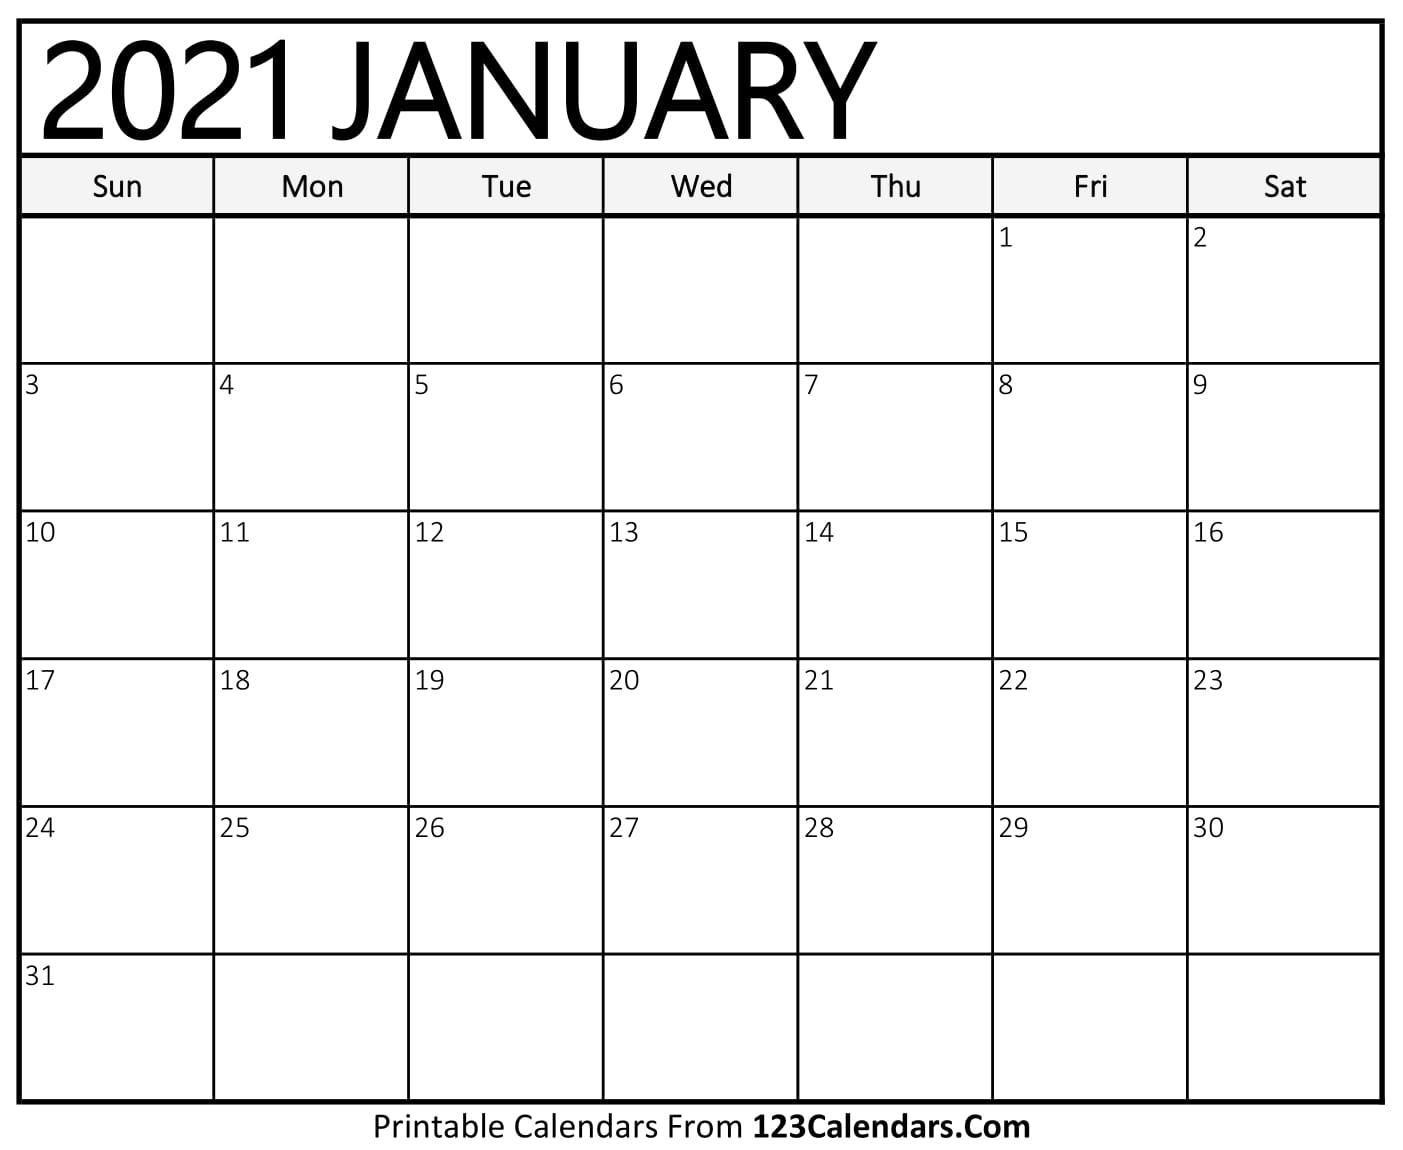 Google Free Calendars 2021 | Month Calendar Printable